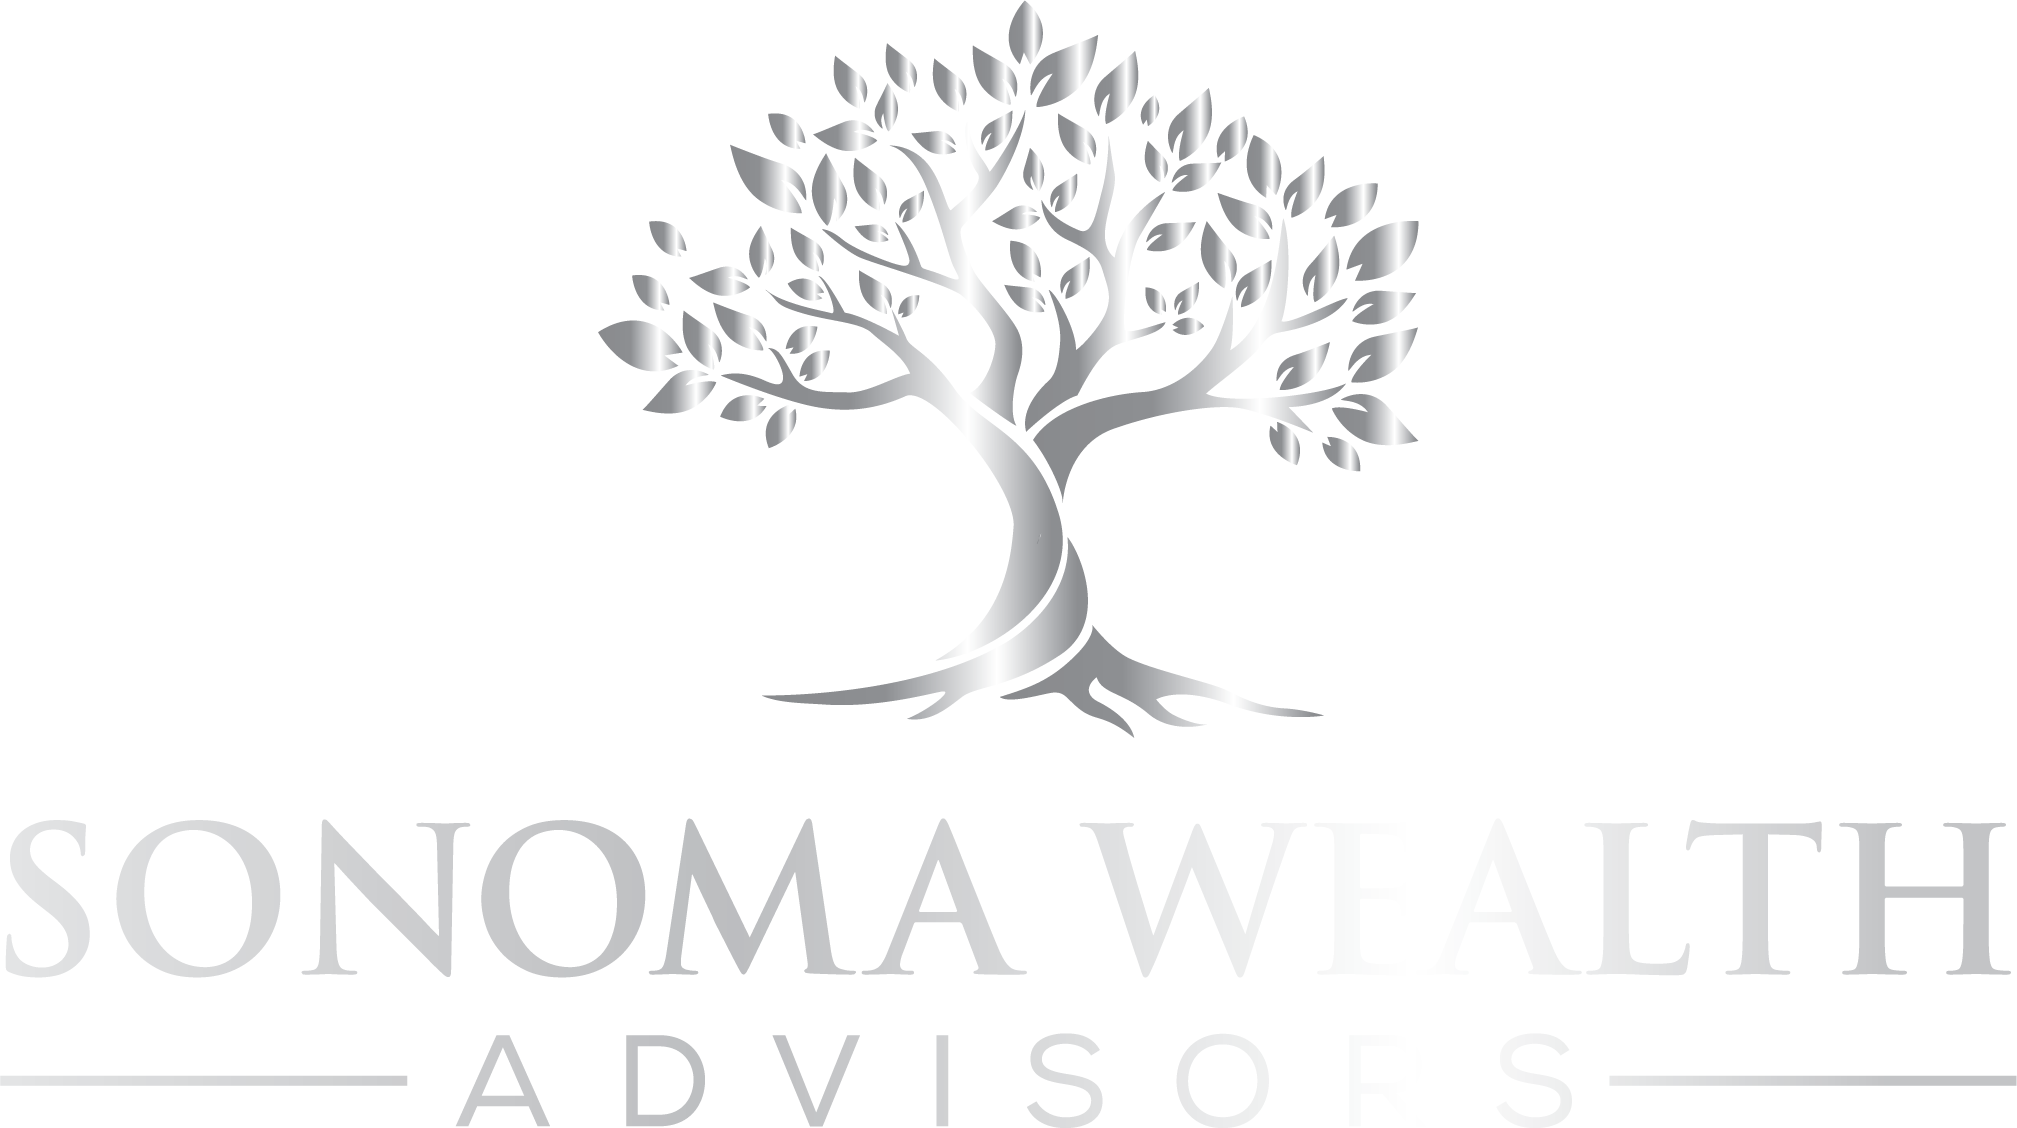 Sonoma Wealth Advisors logo, Sonoma CA, Sonoma Wealth Advisors